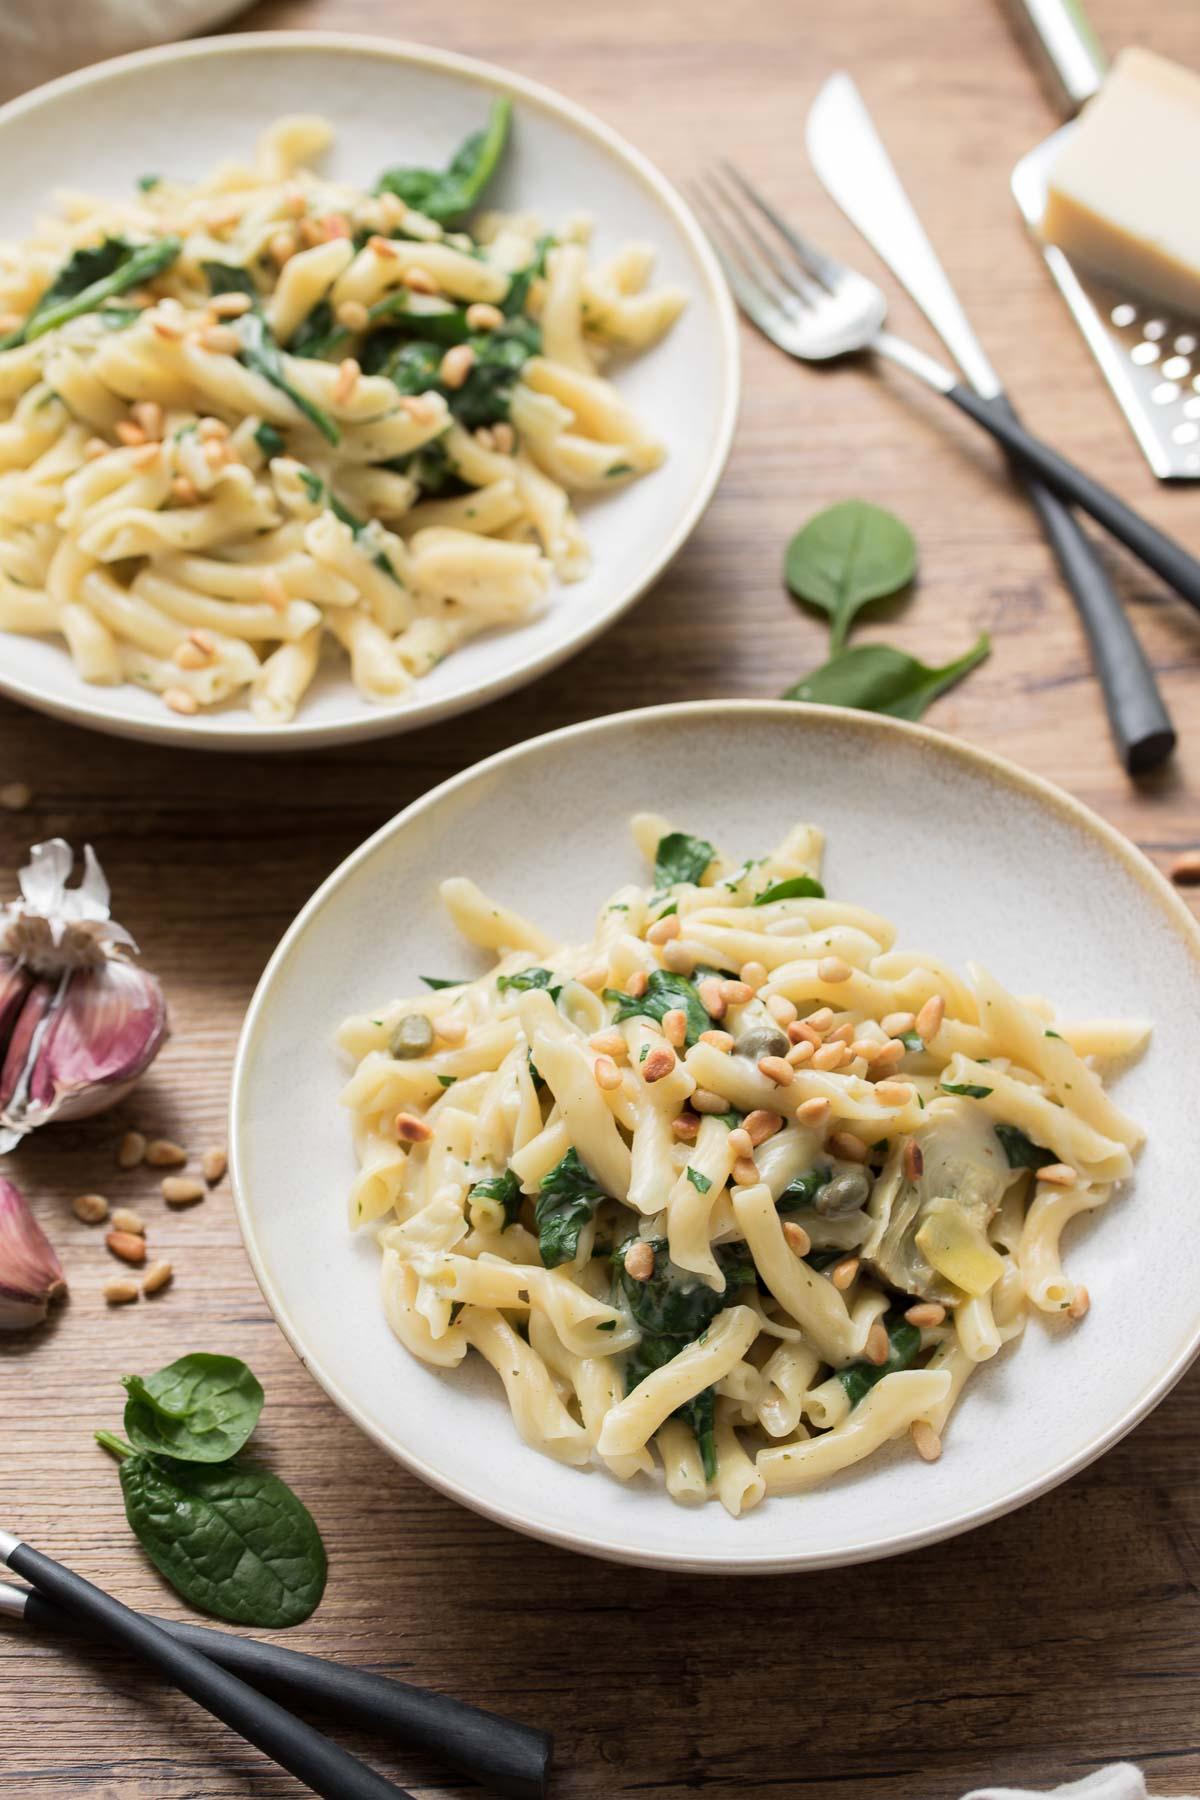 Creamy One Pot Pasta with Artichokes & Lemon